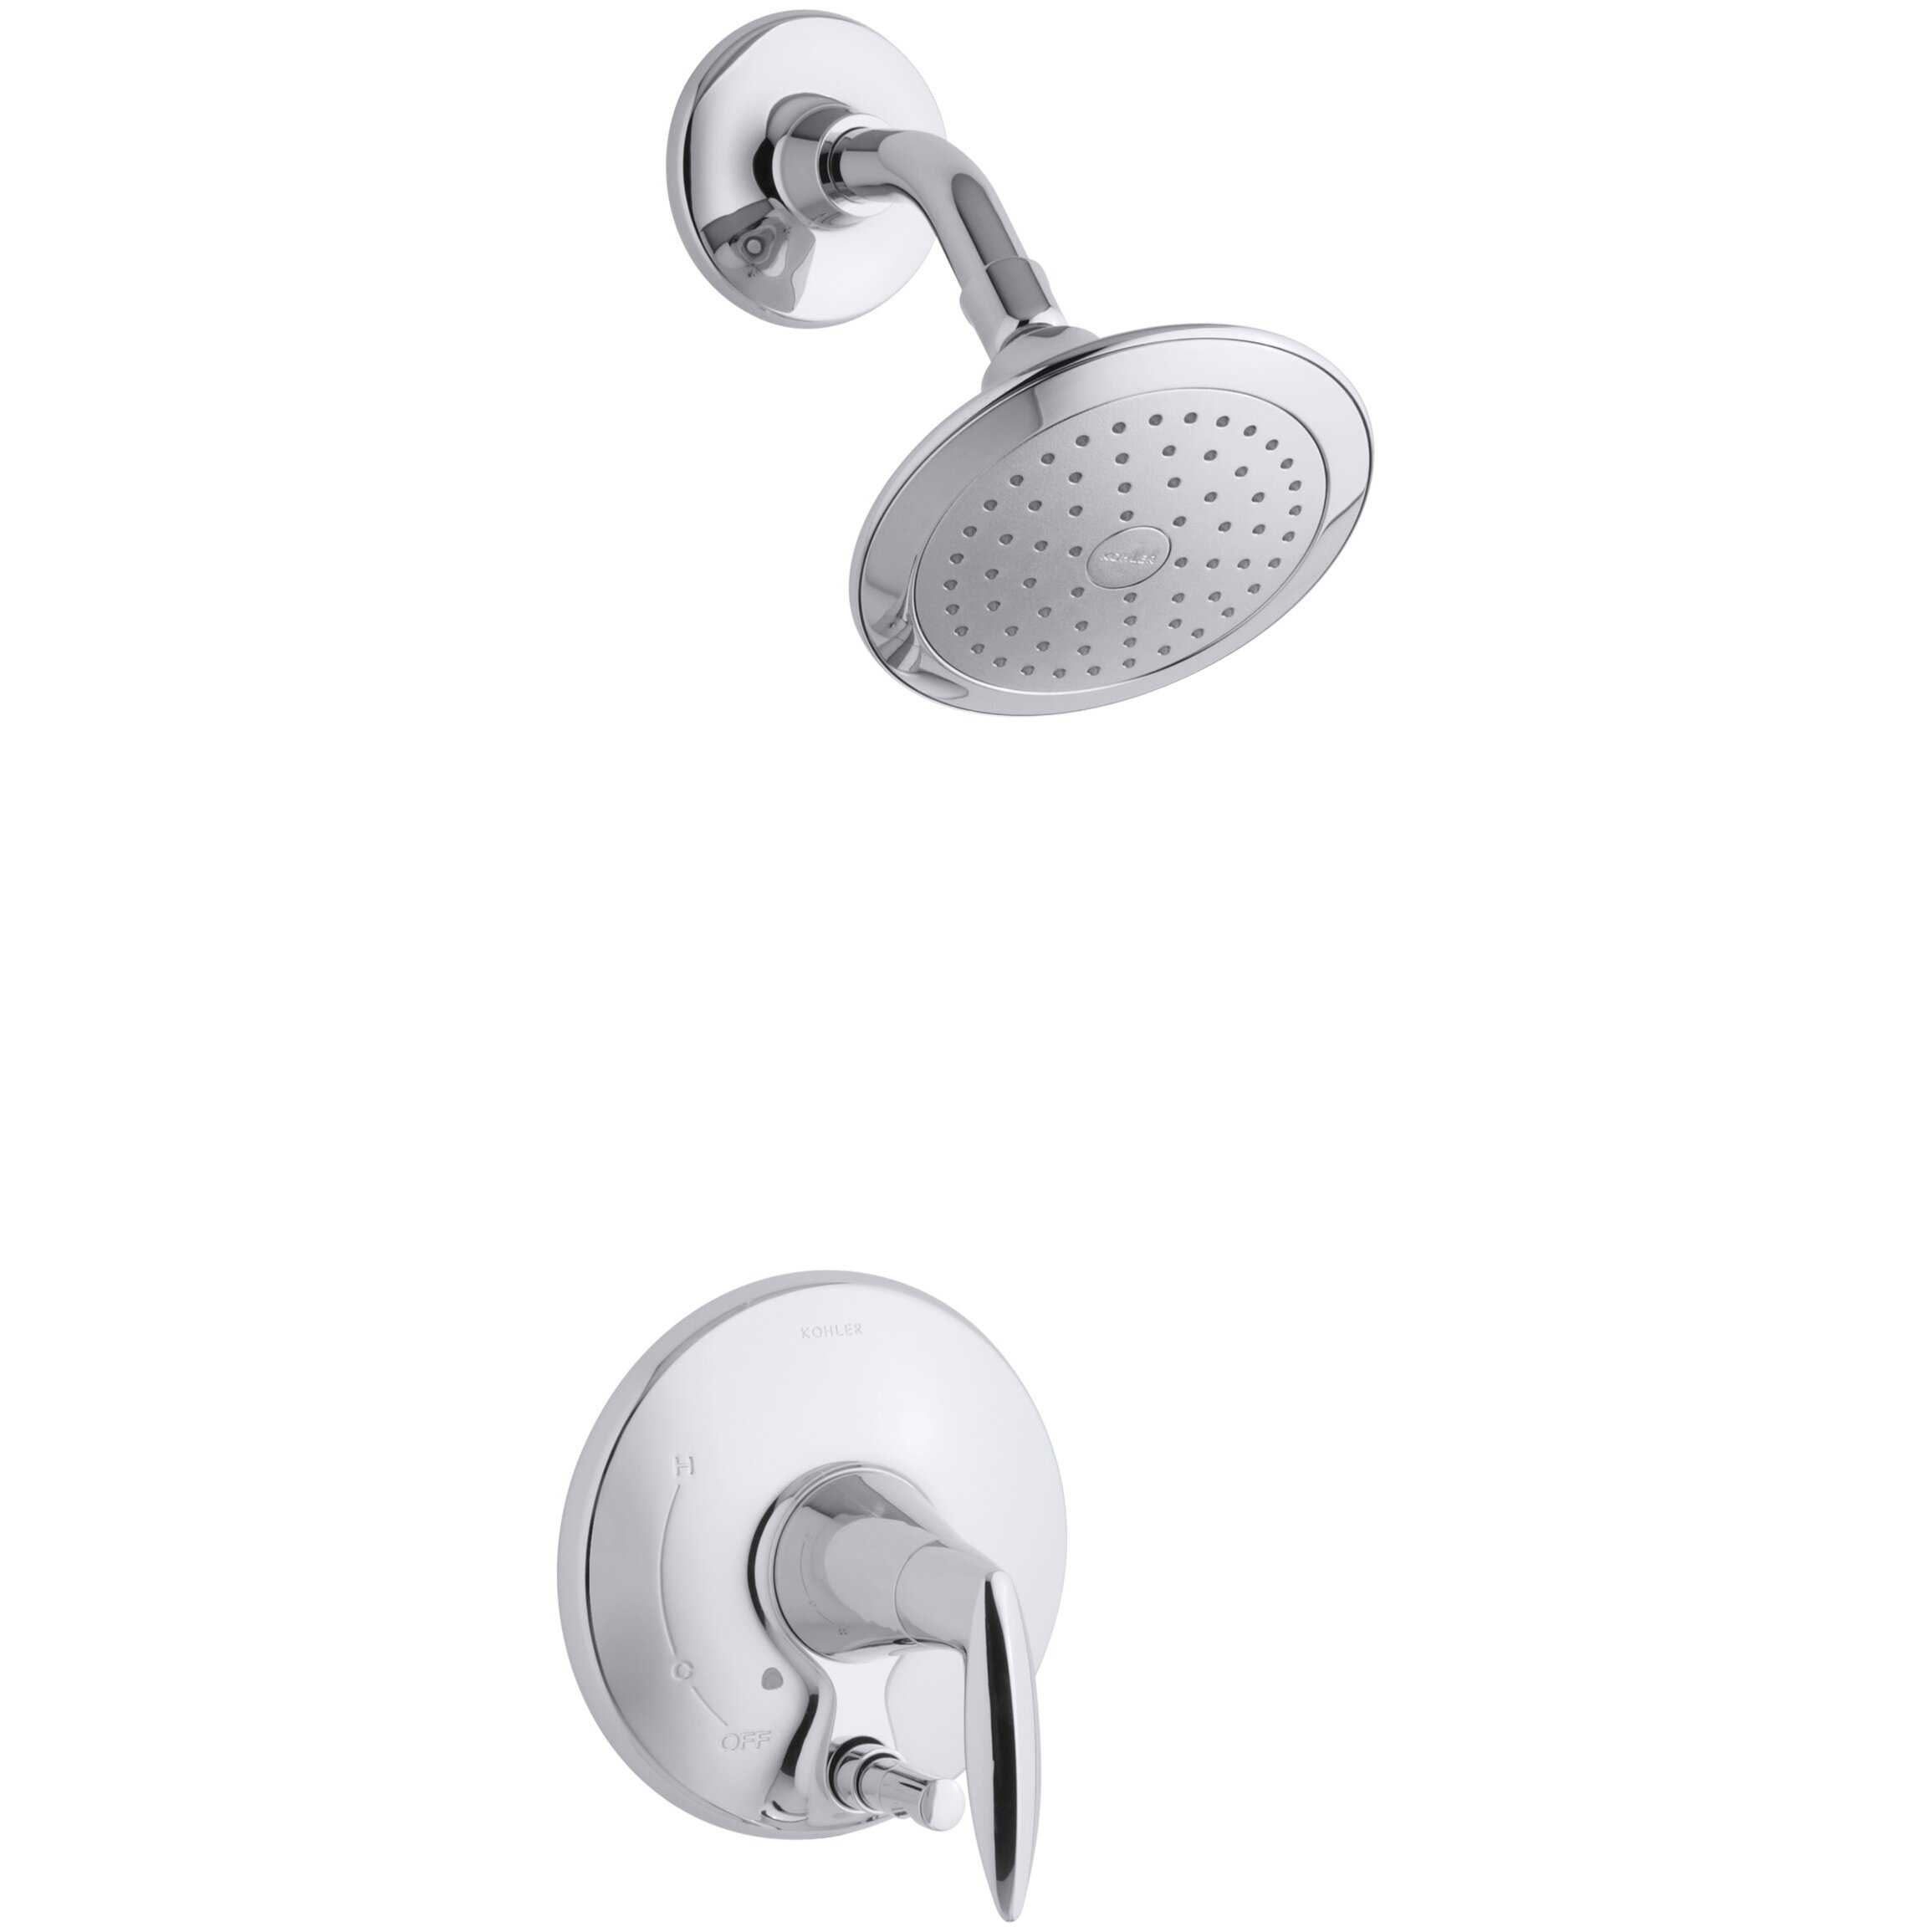 Kohler Alteo Shower Faucet Trim With Metal Lever Handle